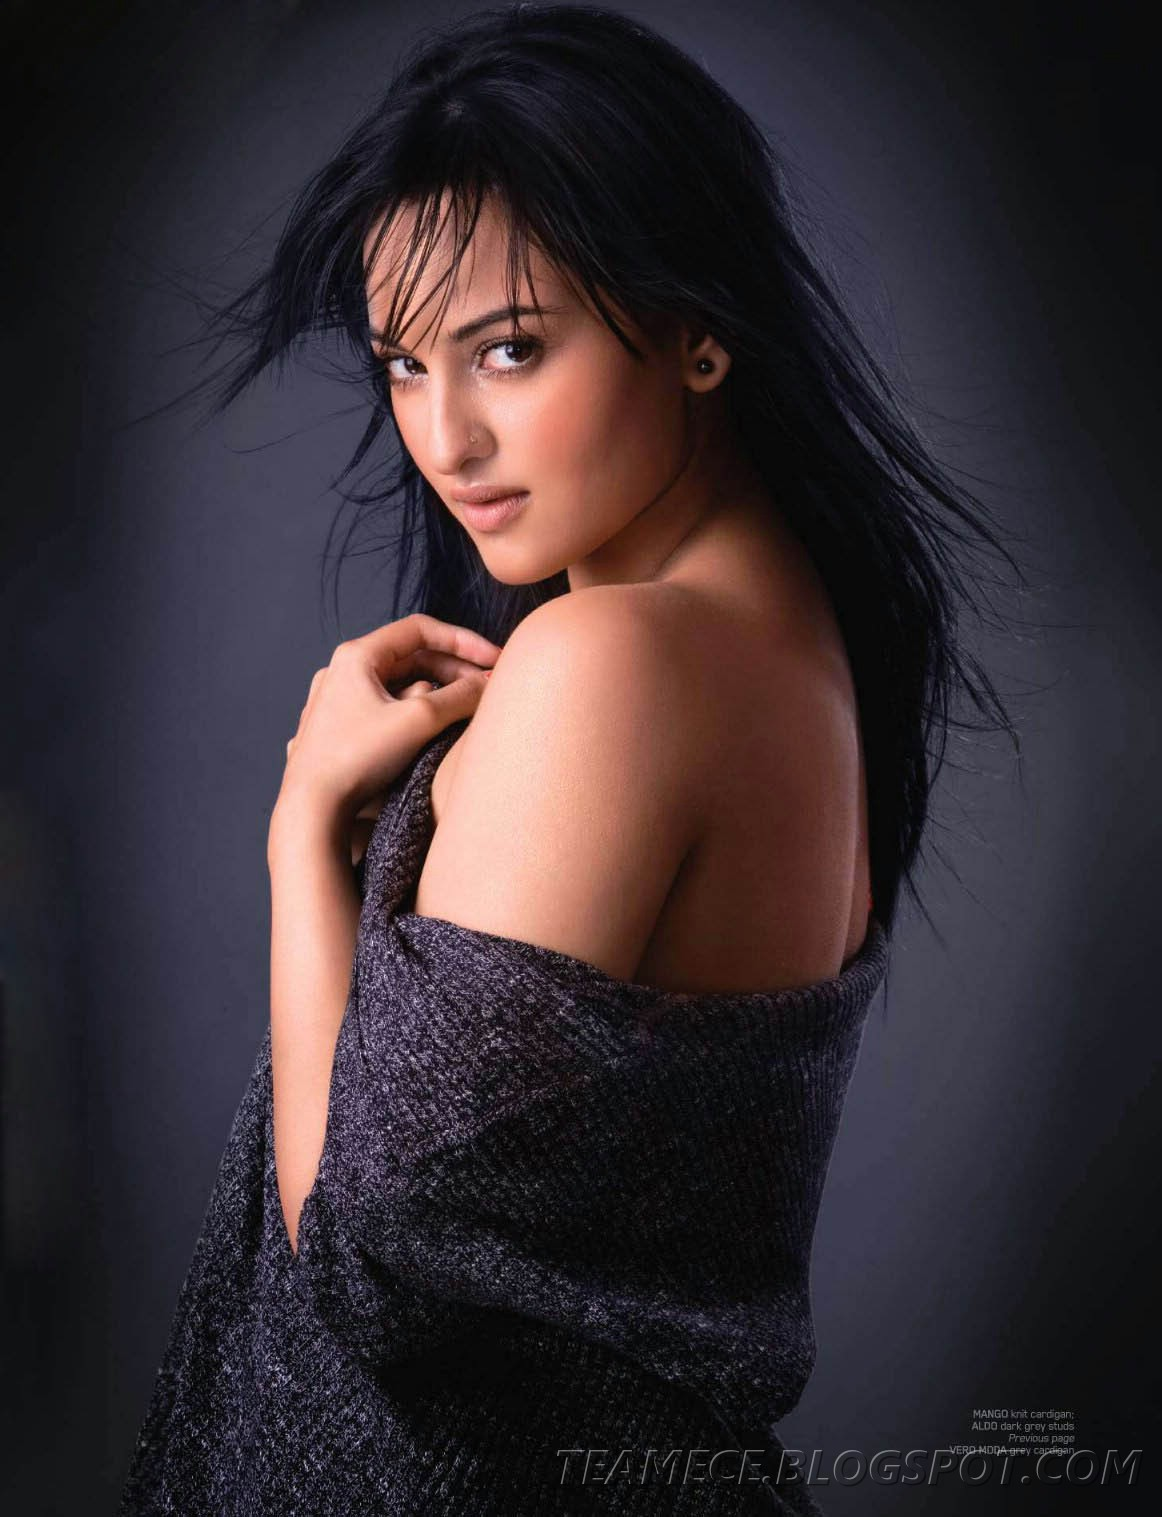 http://4.bp.blogspot.com/_-JJ0txqRqhA/TQZRPdJXlkI/AAAAAAAAB_o/F9Gbpg18PXY/s1600/Sonakshi-Sinha-For-Maxim-Magazine-Photo-Shoot.jpg